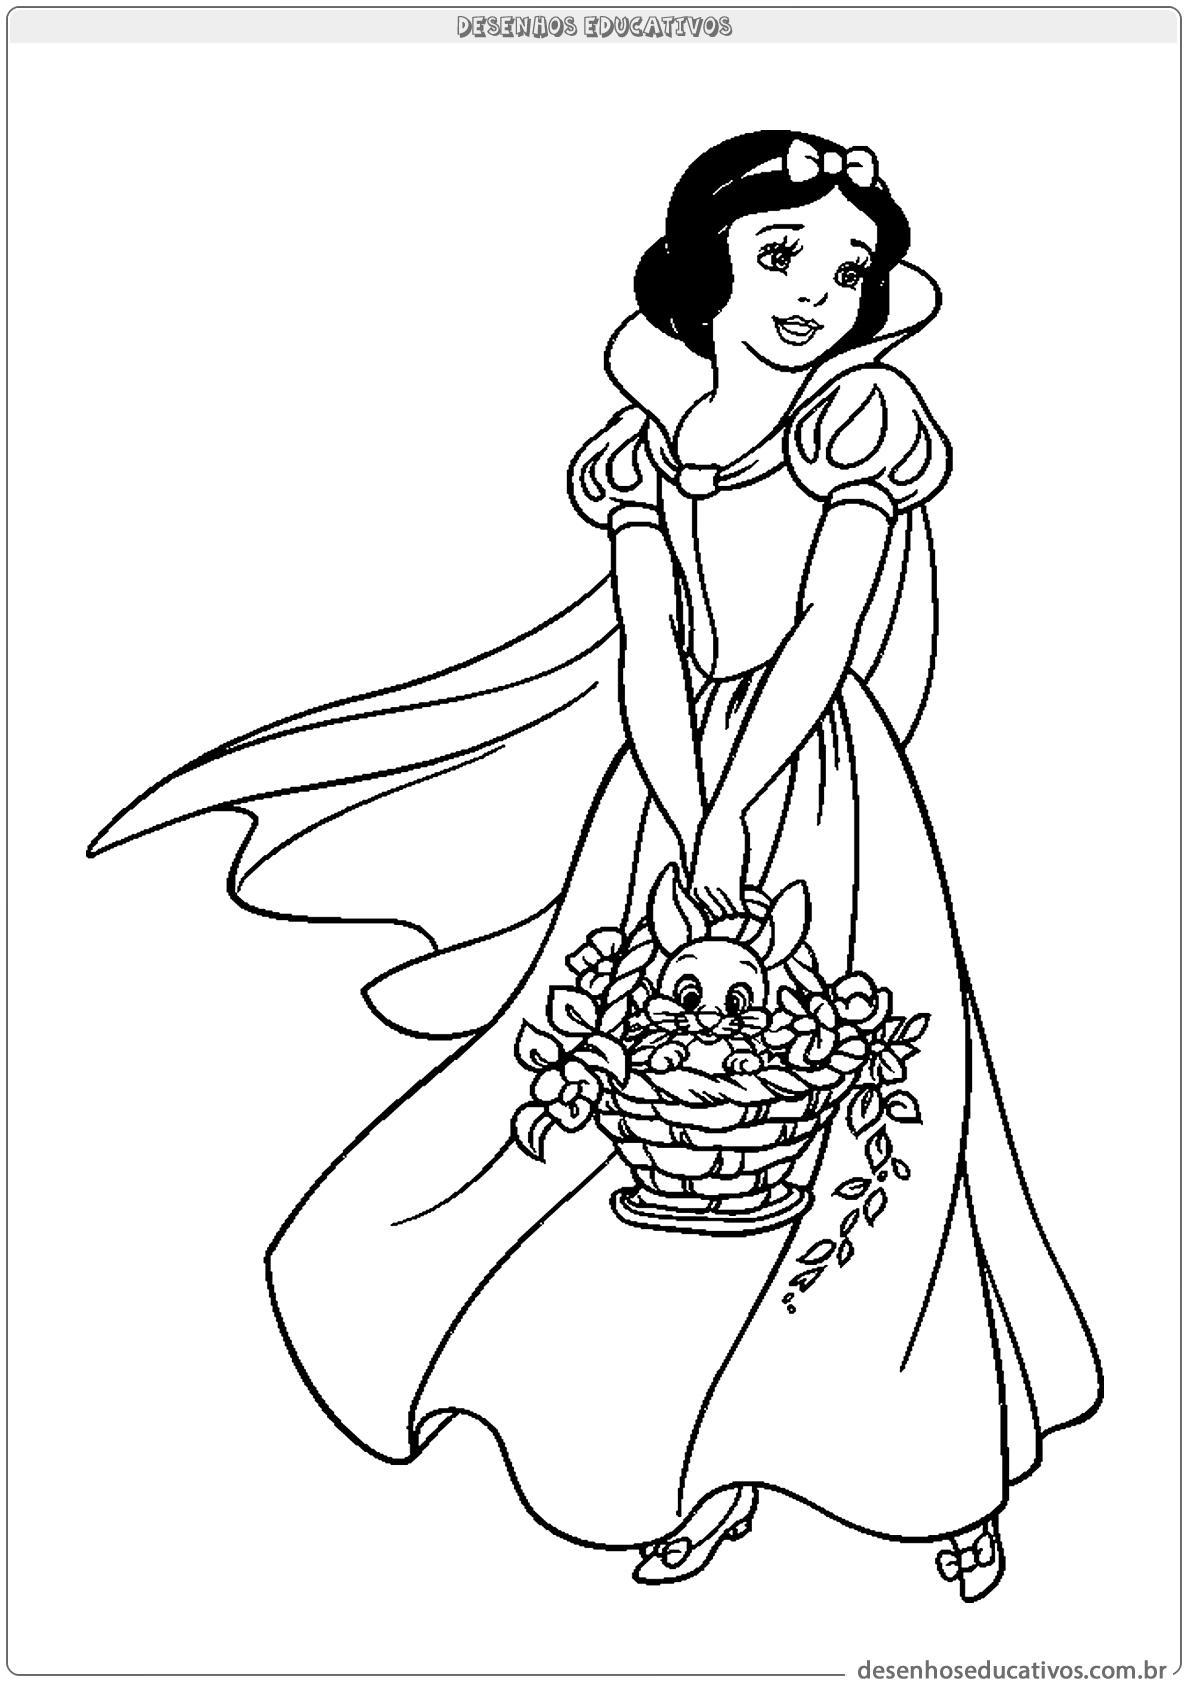 Vamos Colorir A Branca De Neve Desenhos Educativos